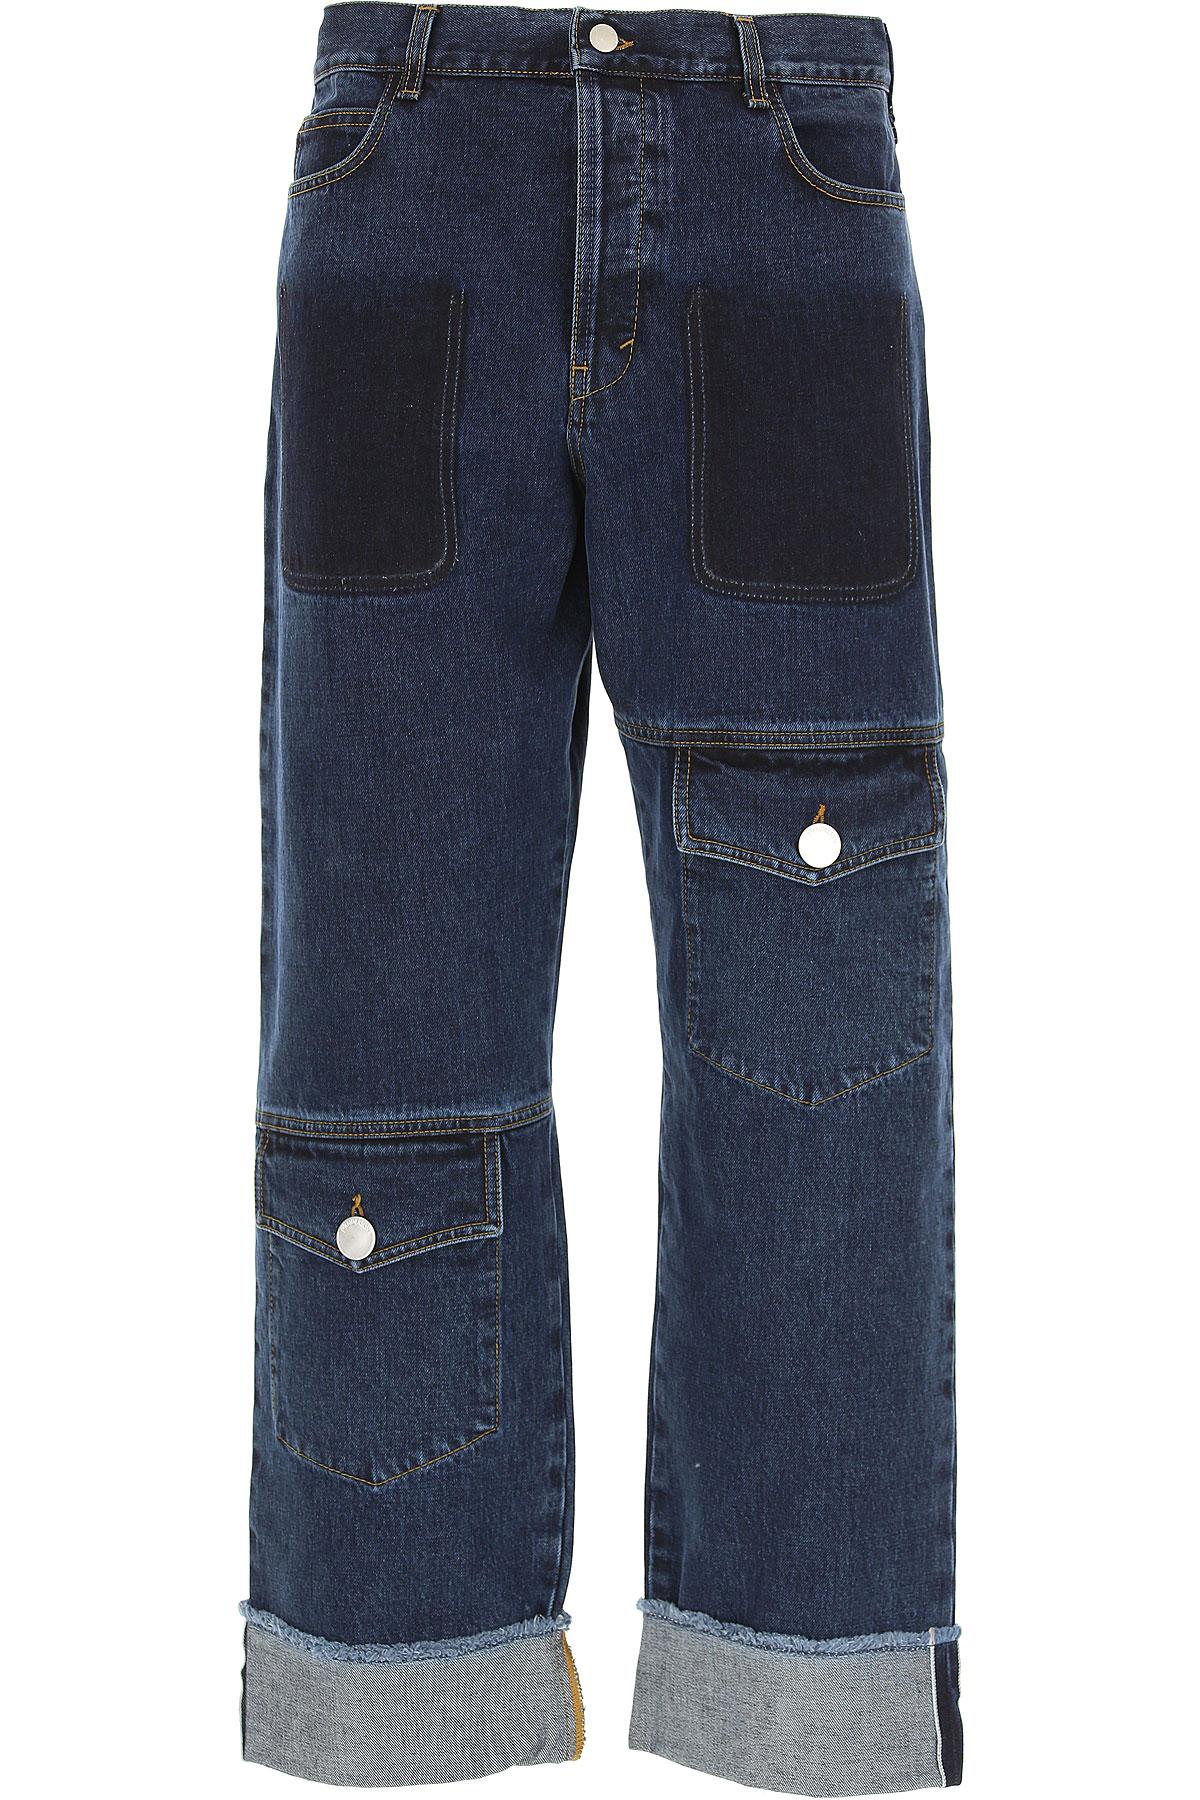 Image of J.W.Anderson Jeans, Denim, Cotton, 2017, 32 34